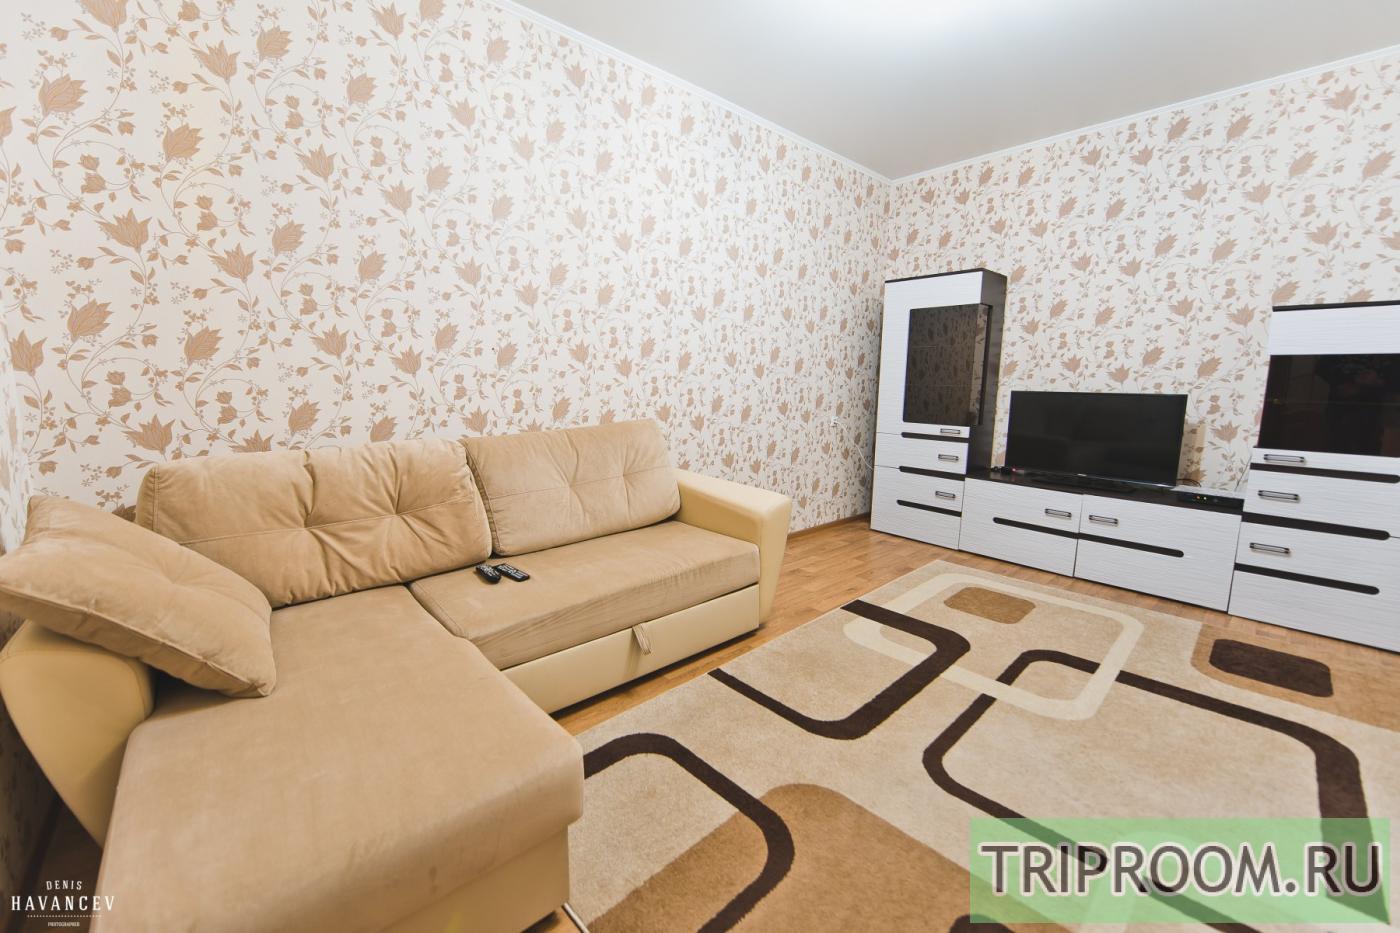 1-комнатная квартира посуточно (вариант № 14832), ул. Пугачева улица, фото № 7